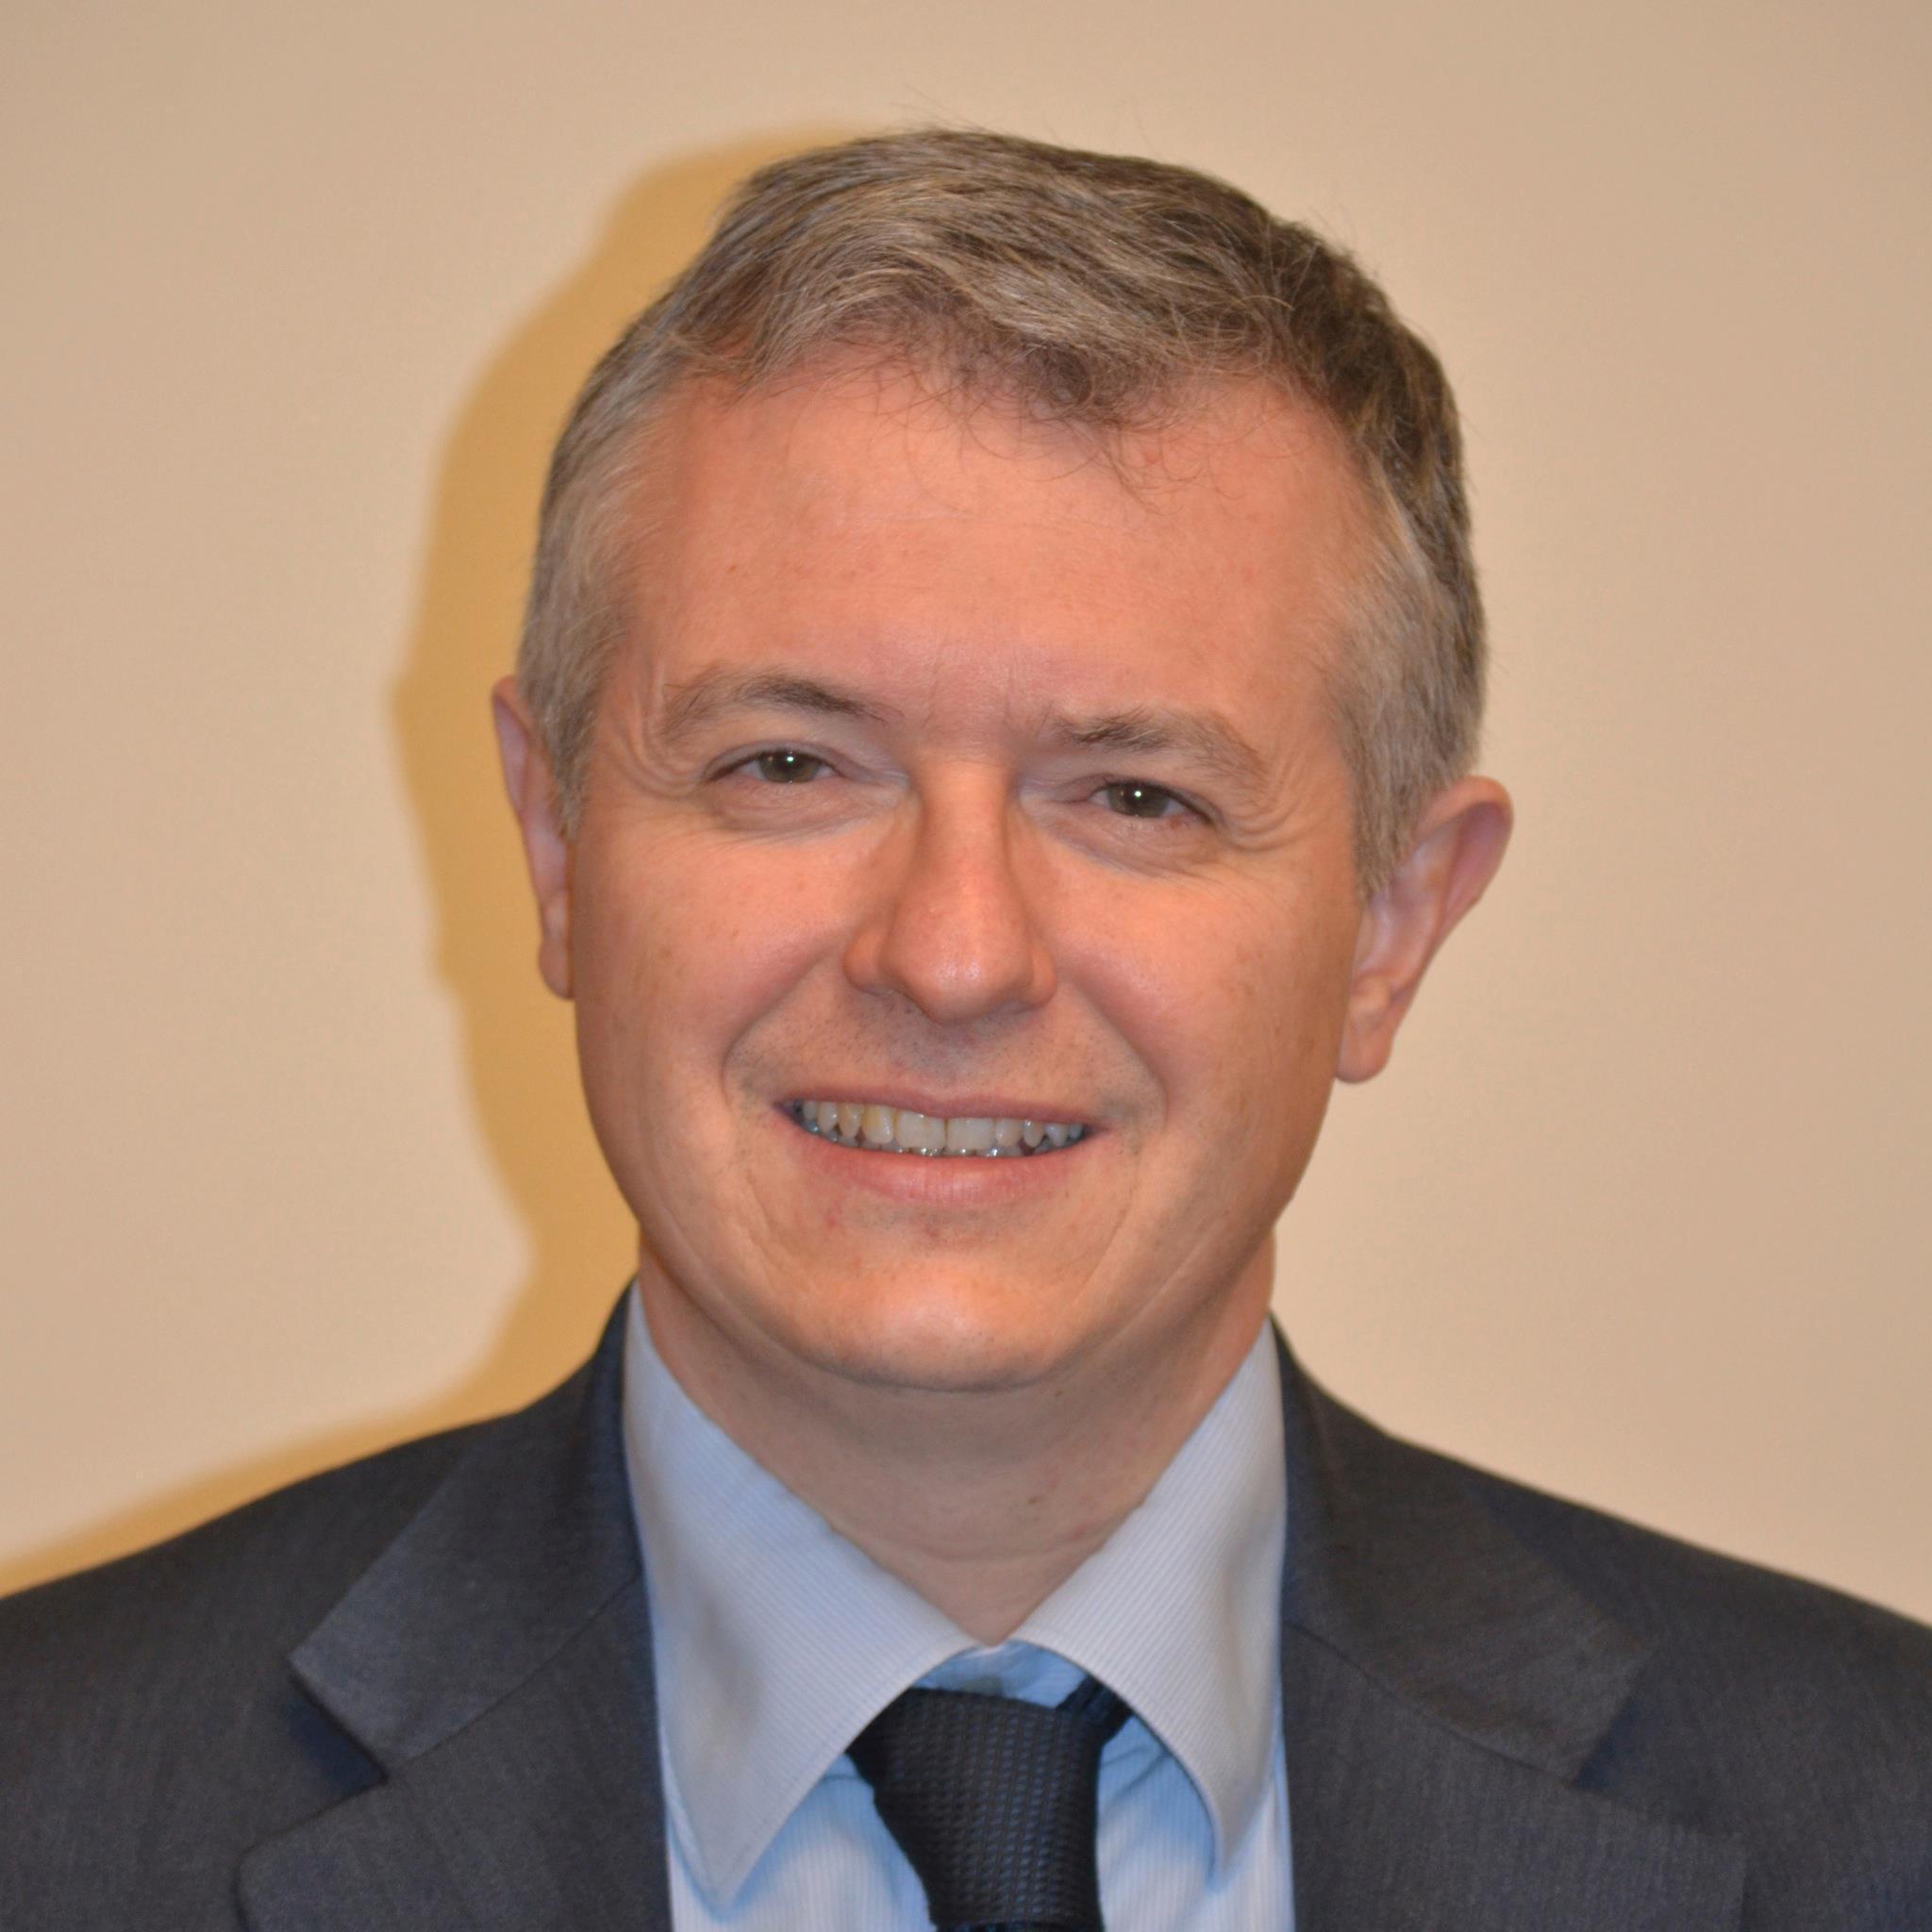 Stefano Gnasso